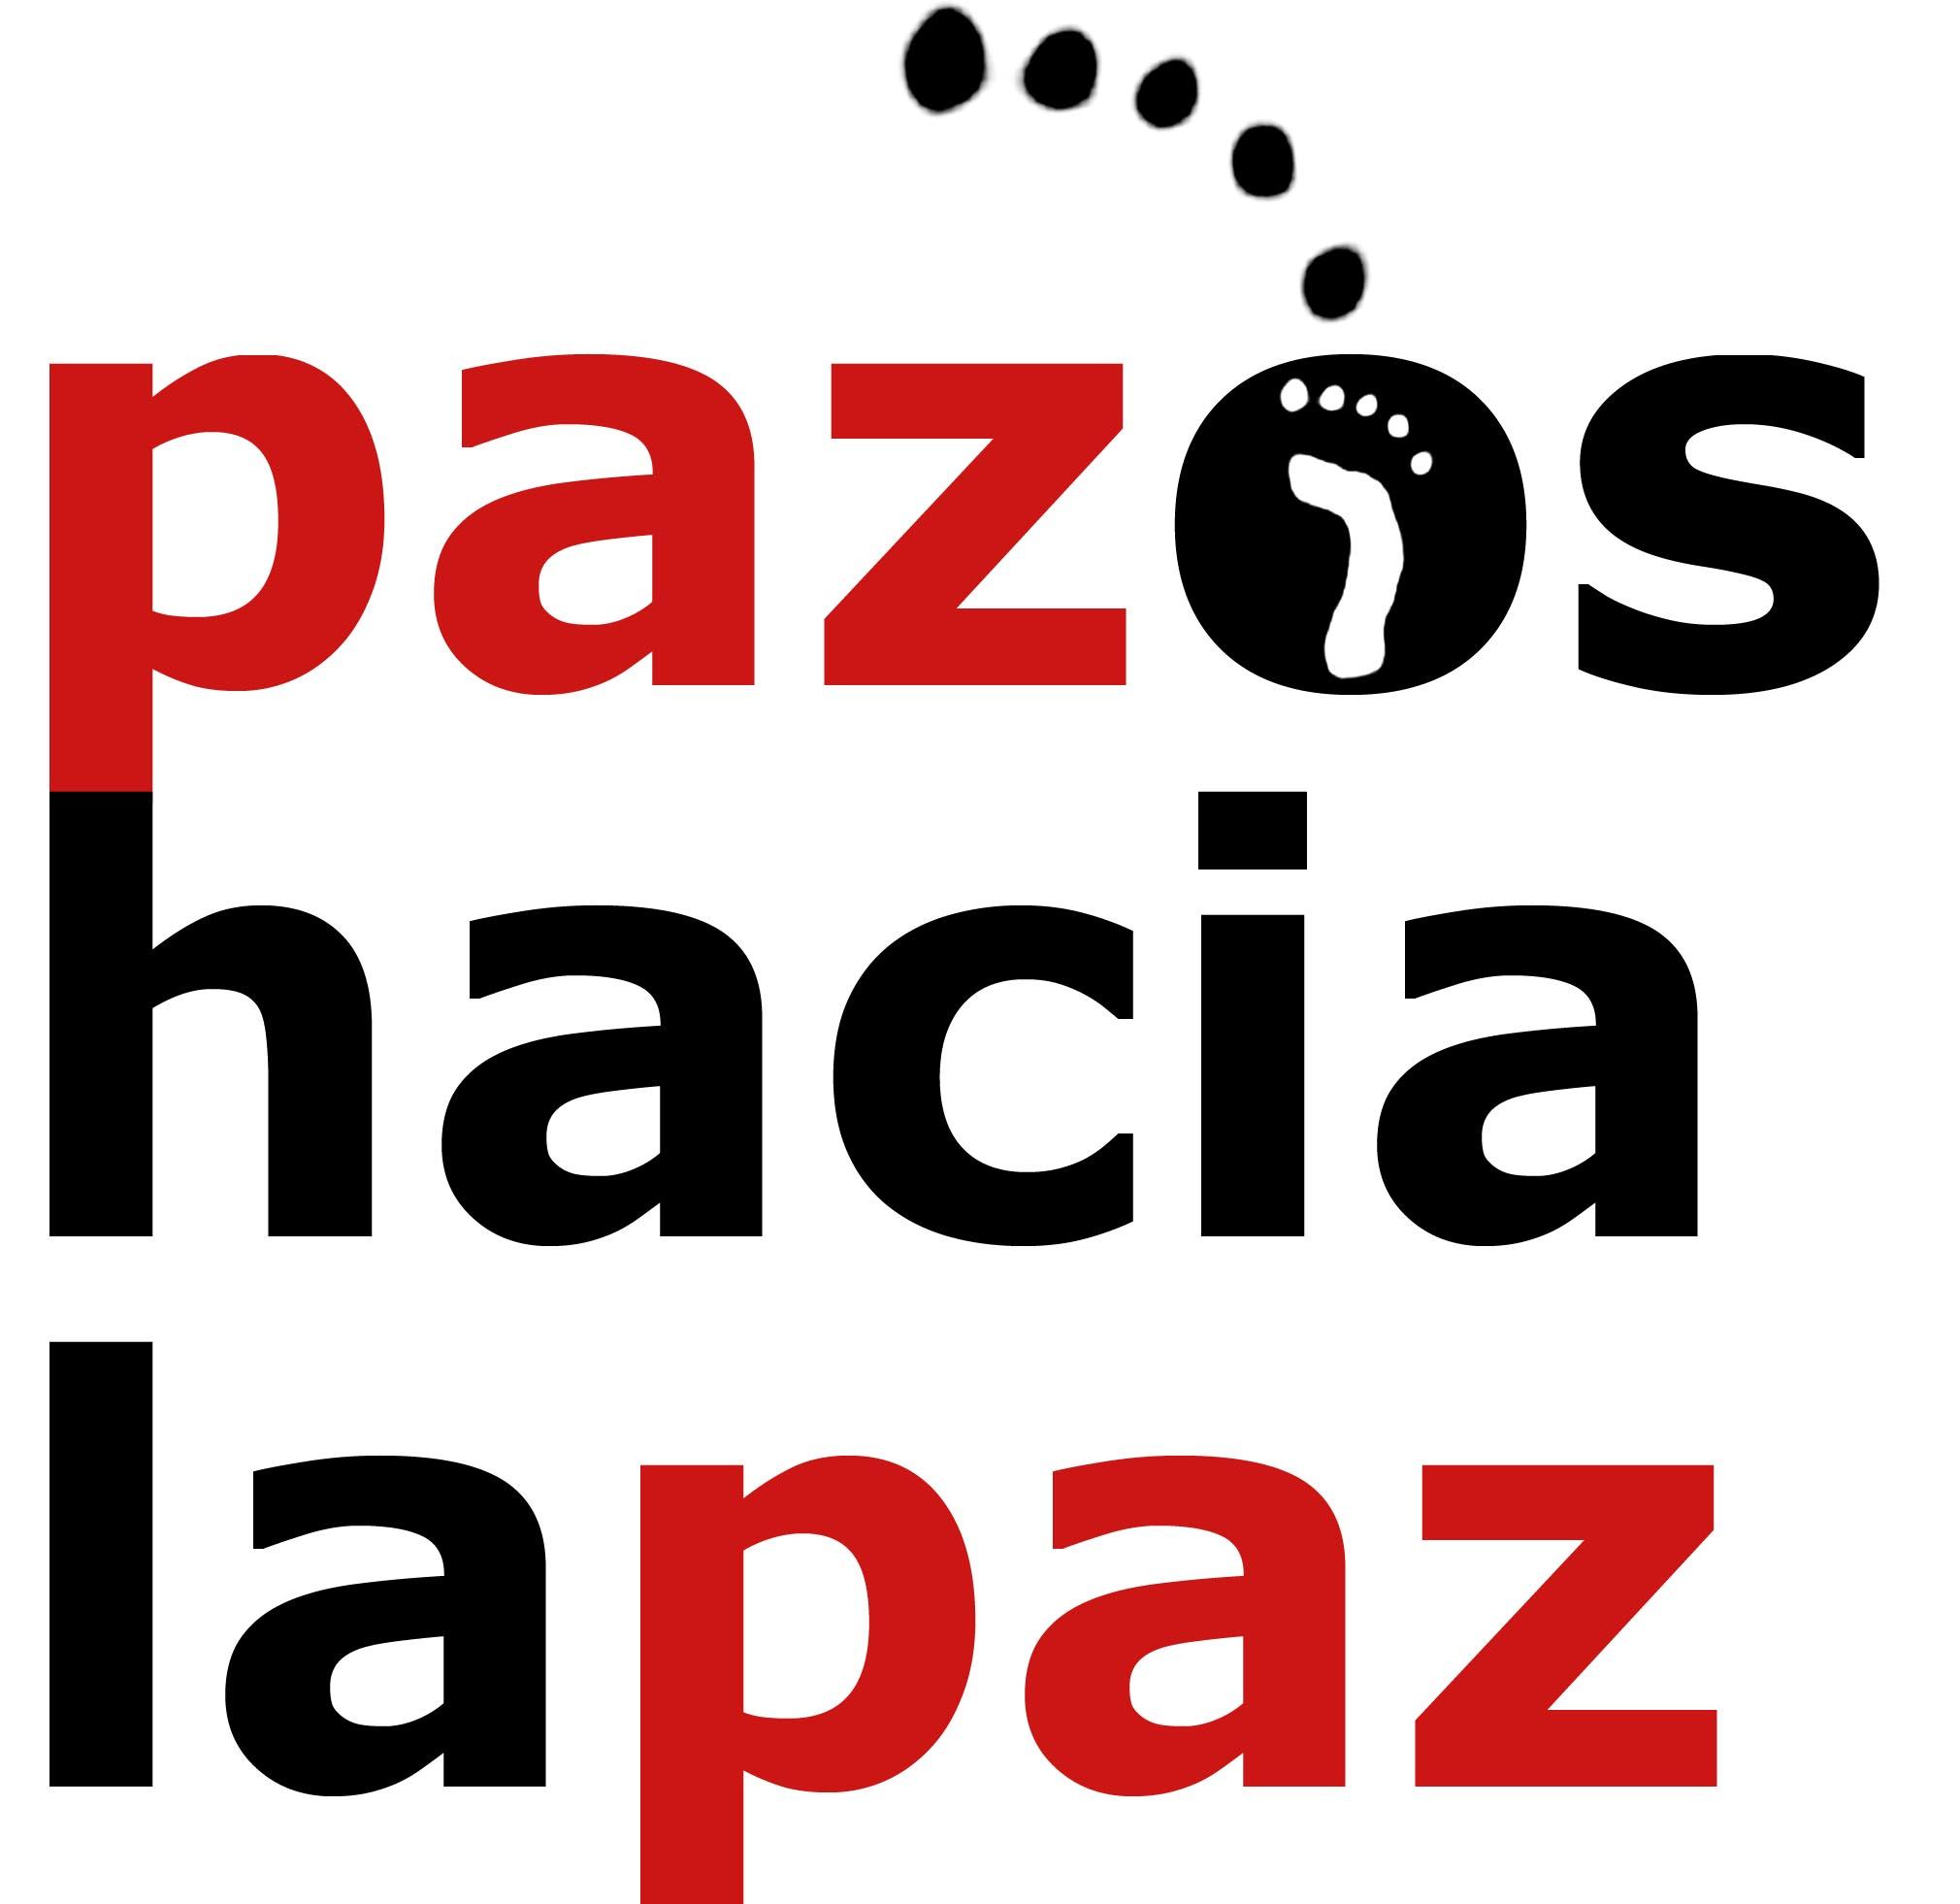 http://www.pozol.org/wp-content/uploads/2012/06/pasospaz-logo_copy.jpg